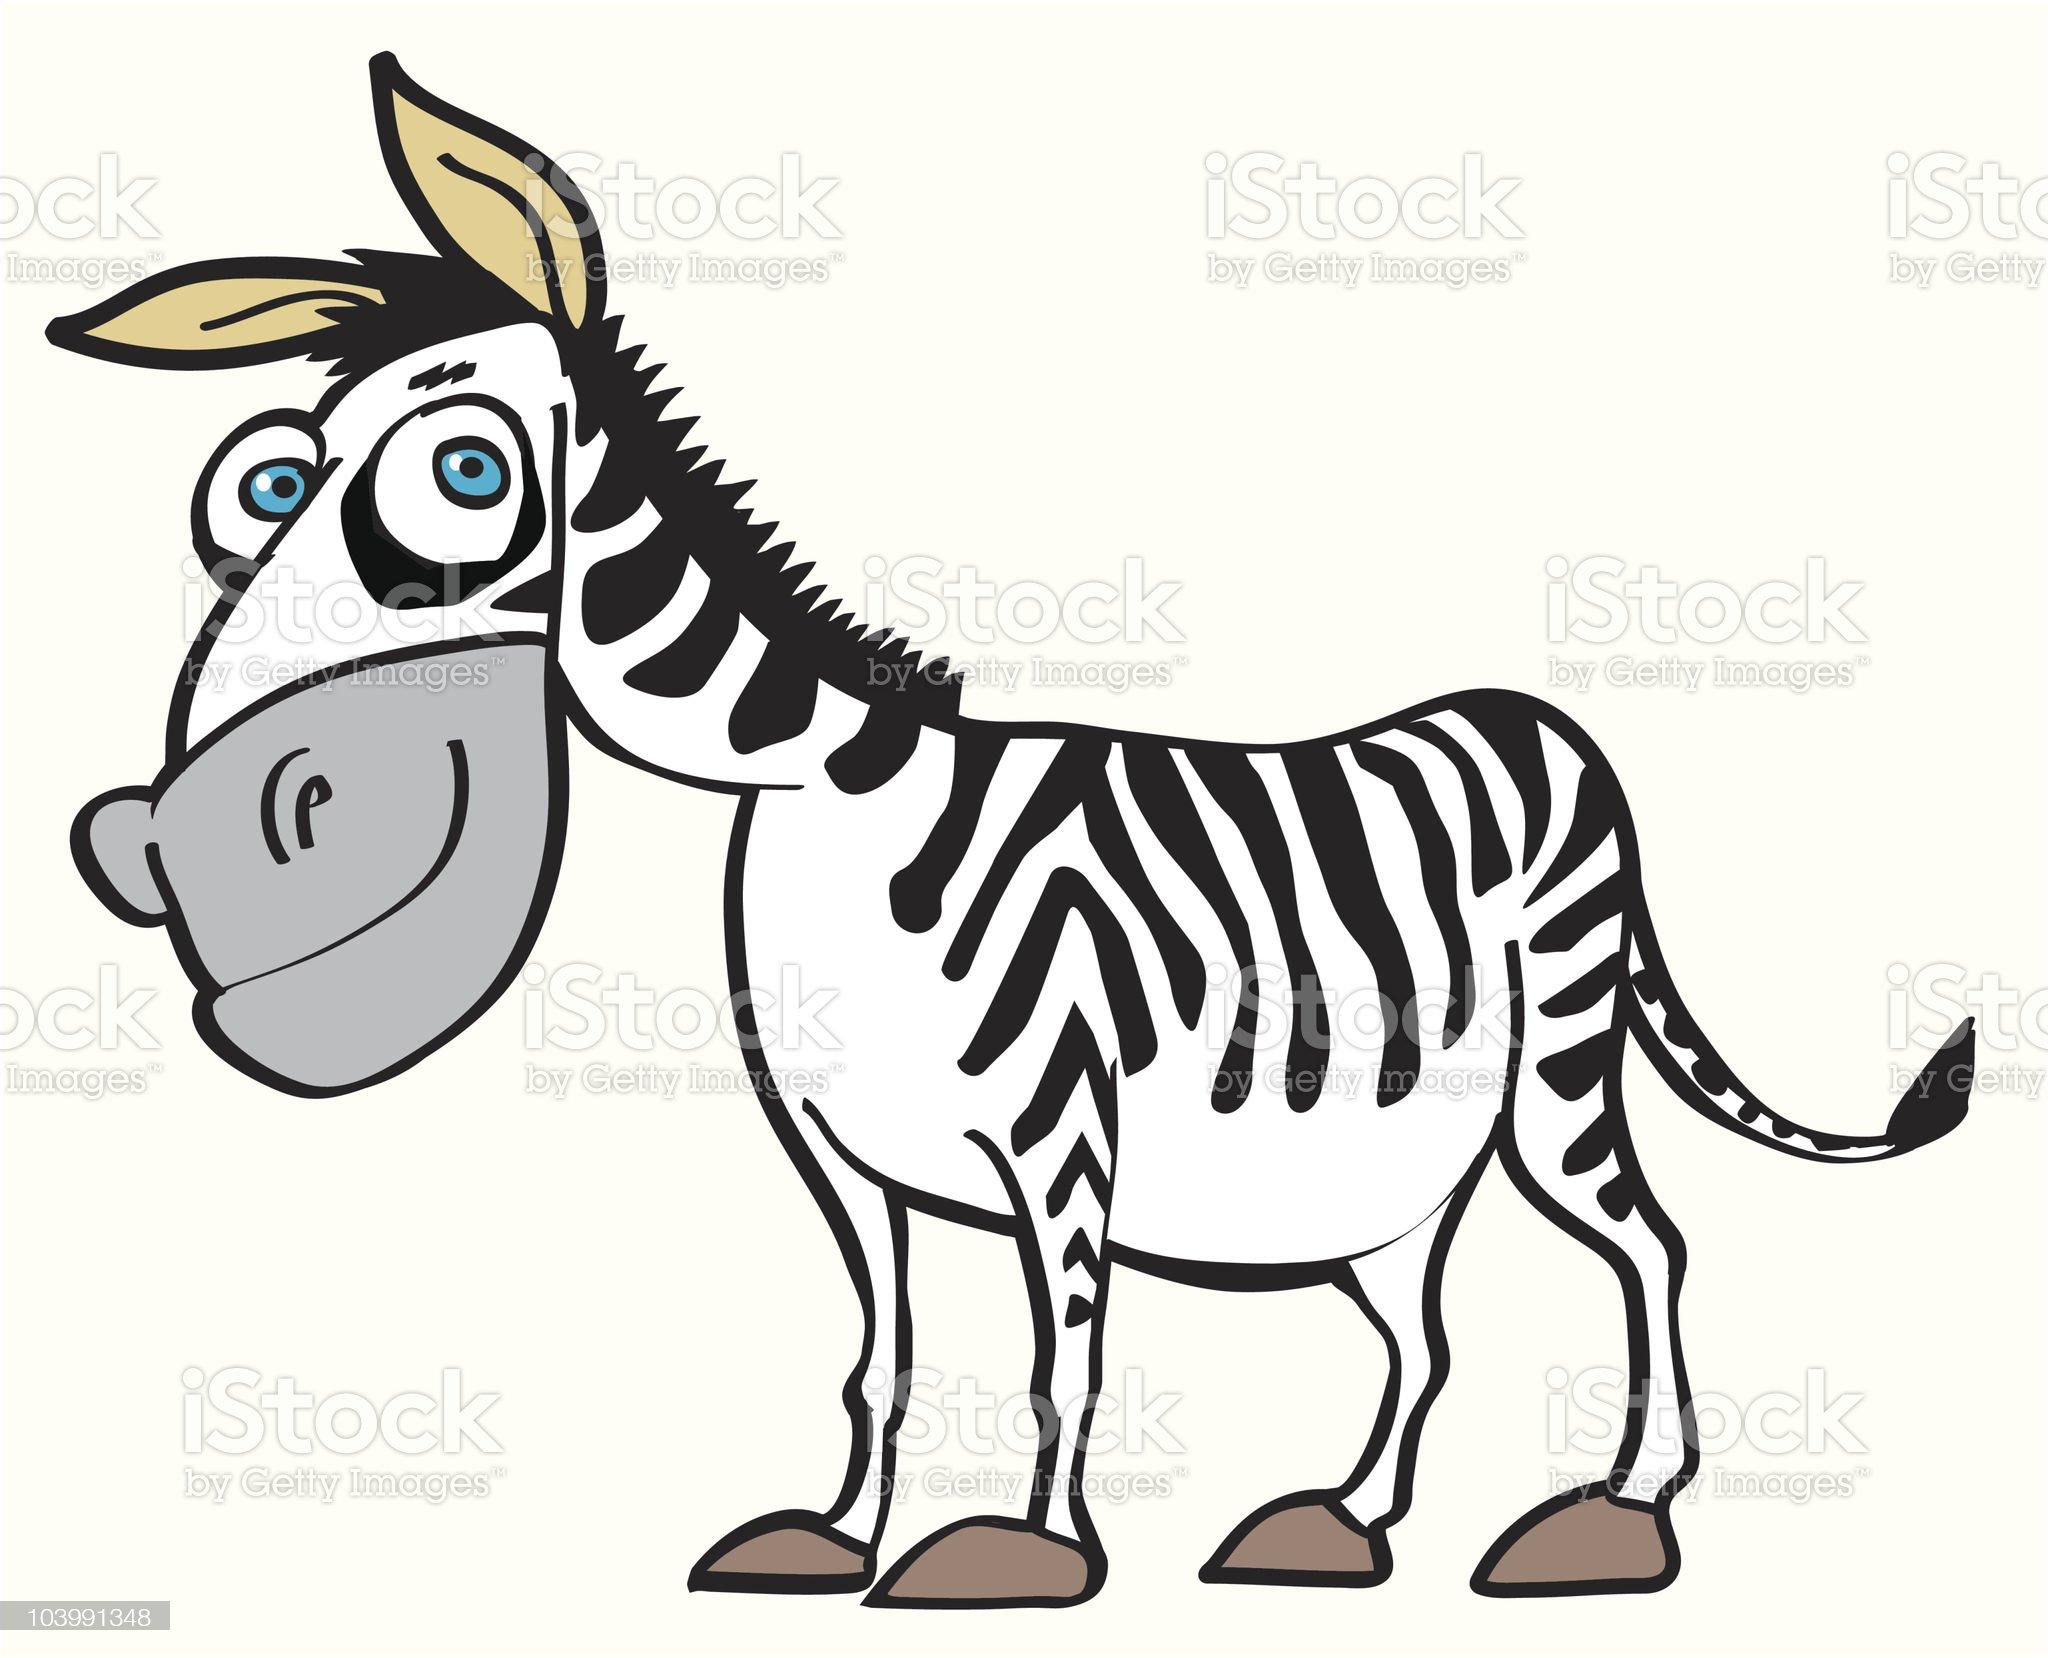 cartoon zebra royalty-free stock vector art